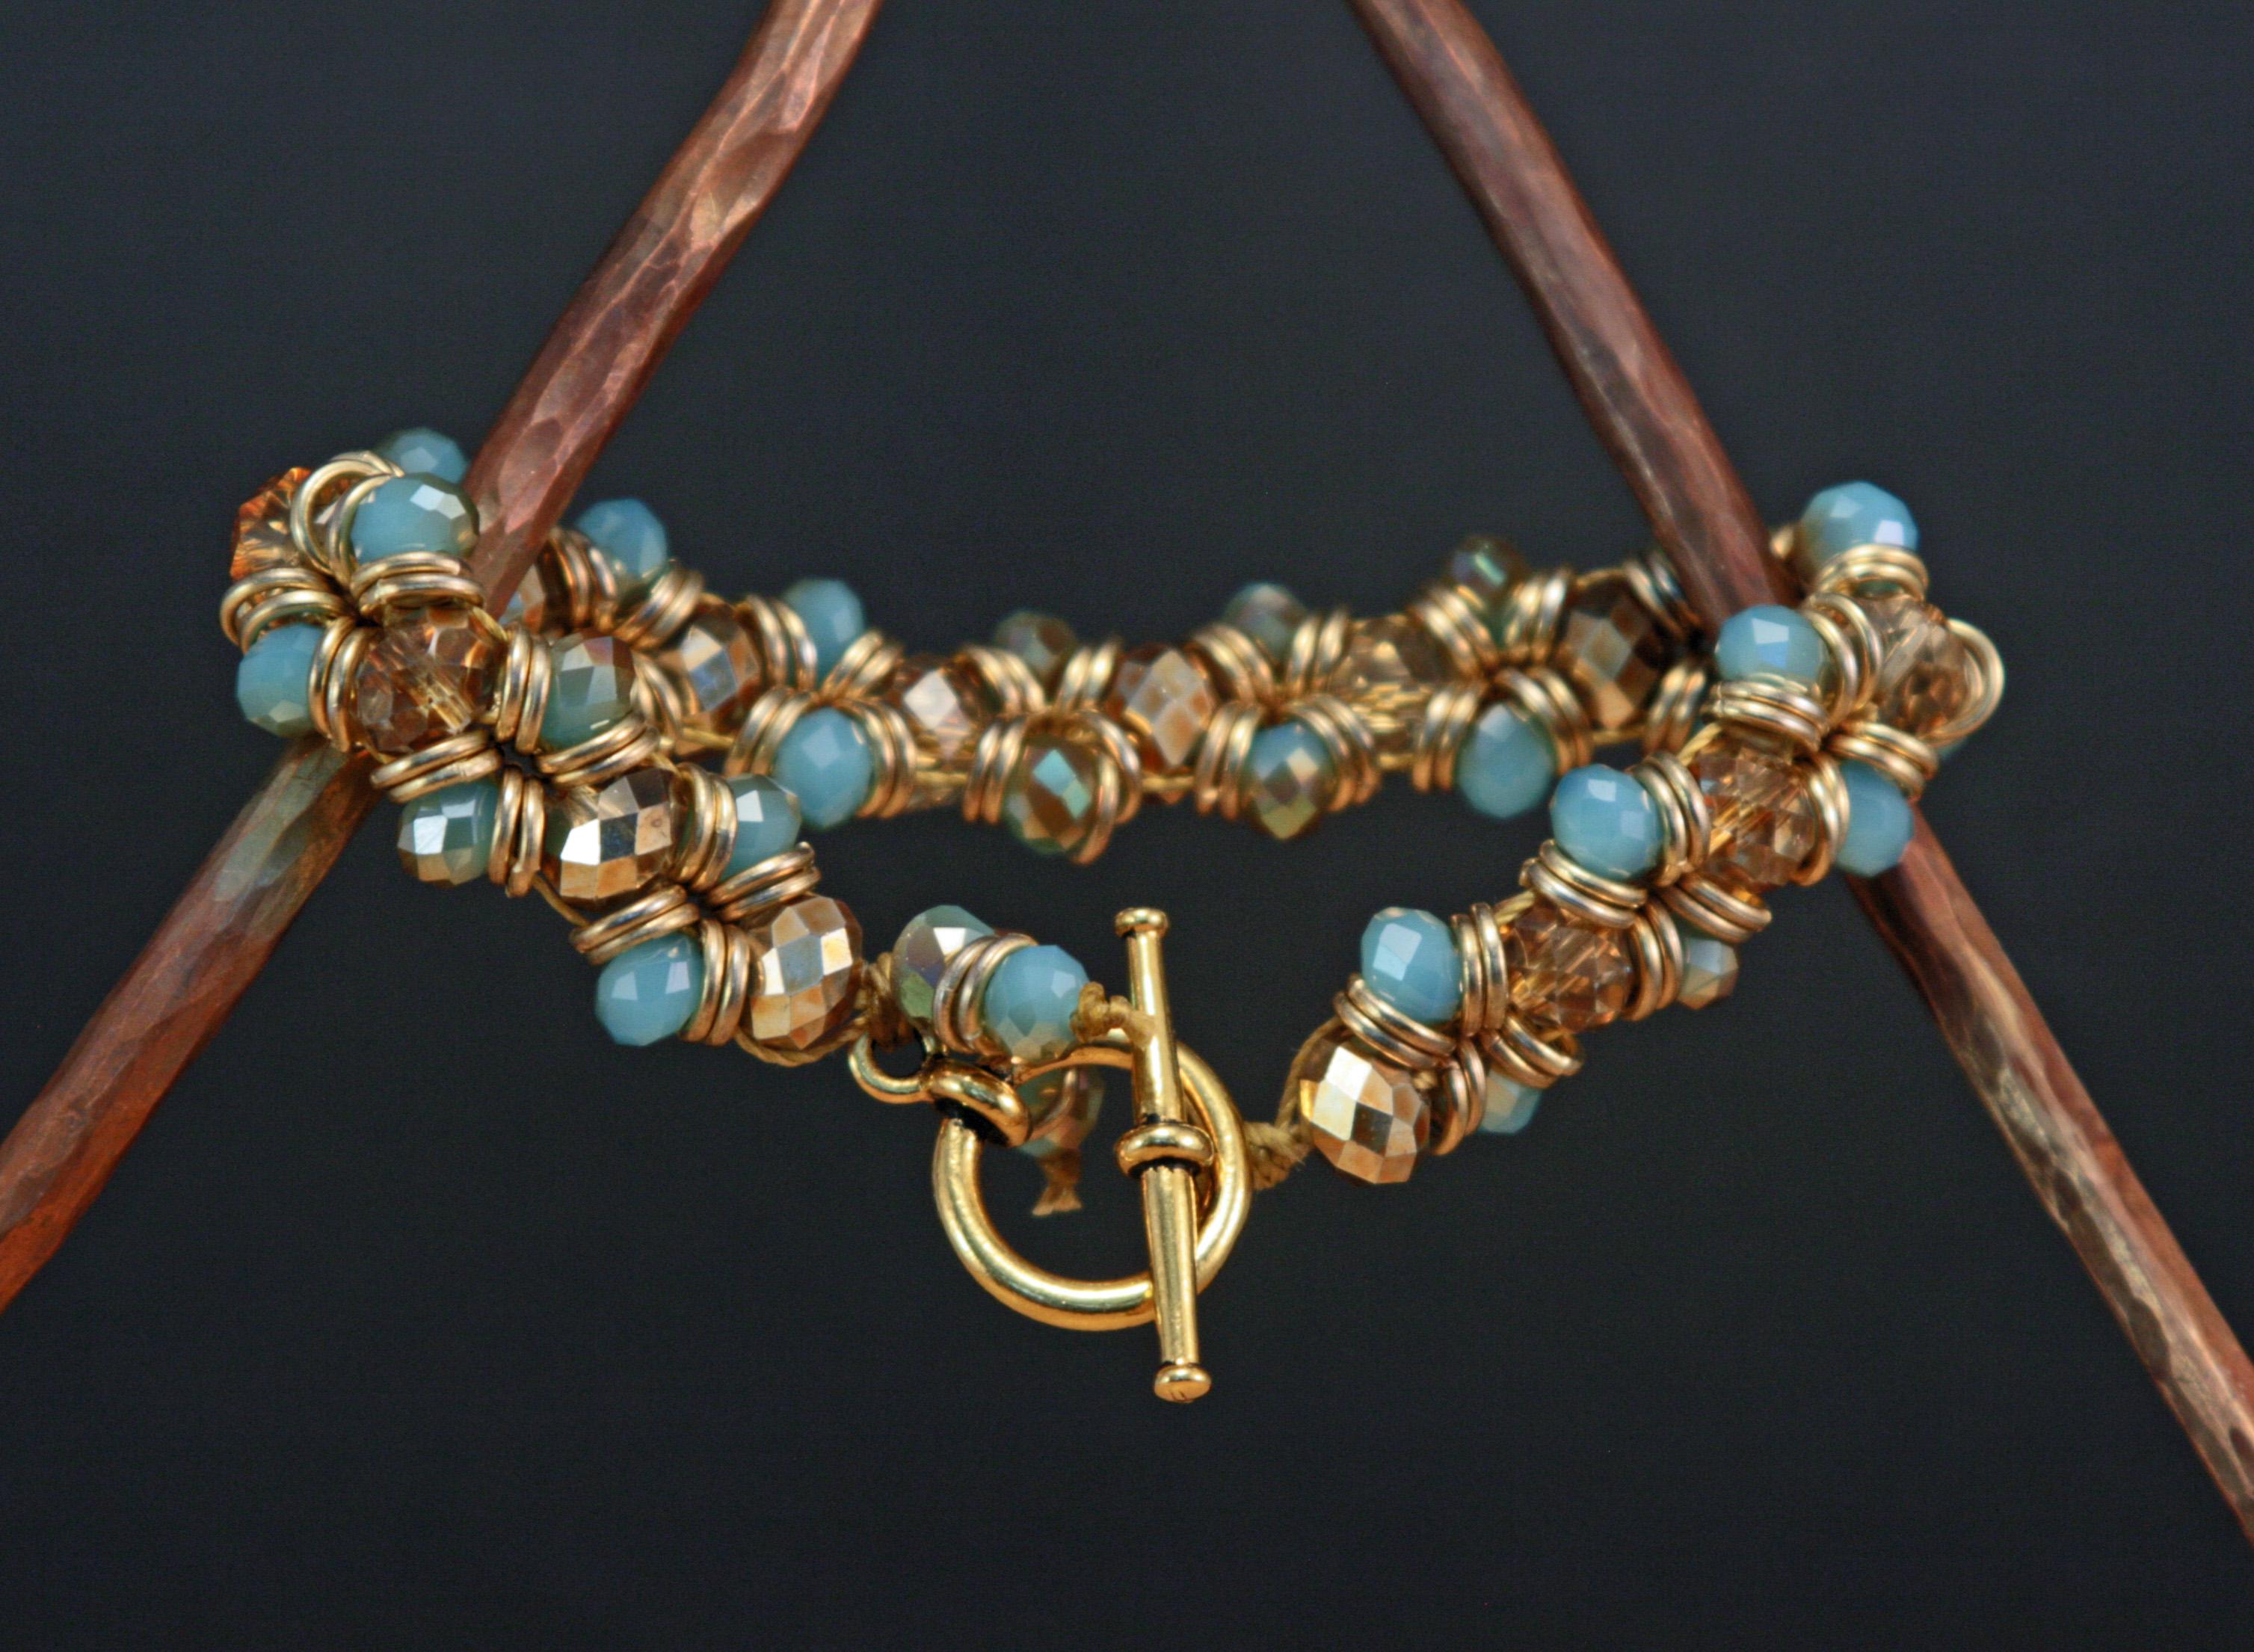 Grand Illusion bracelet